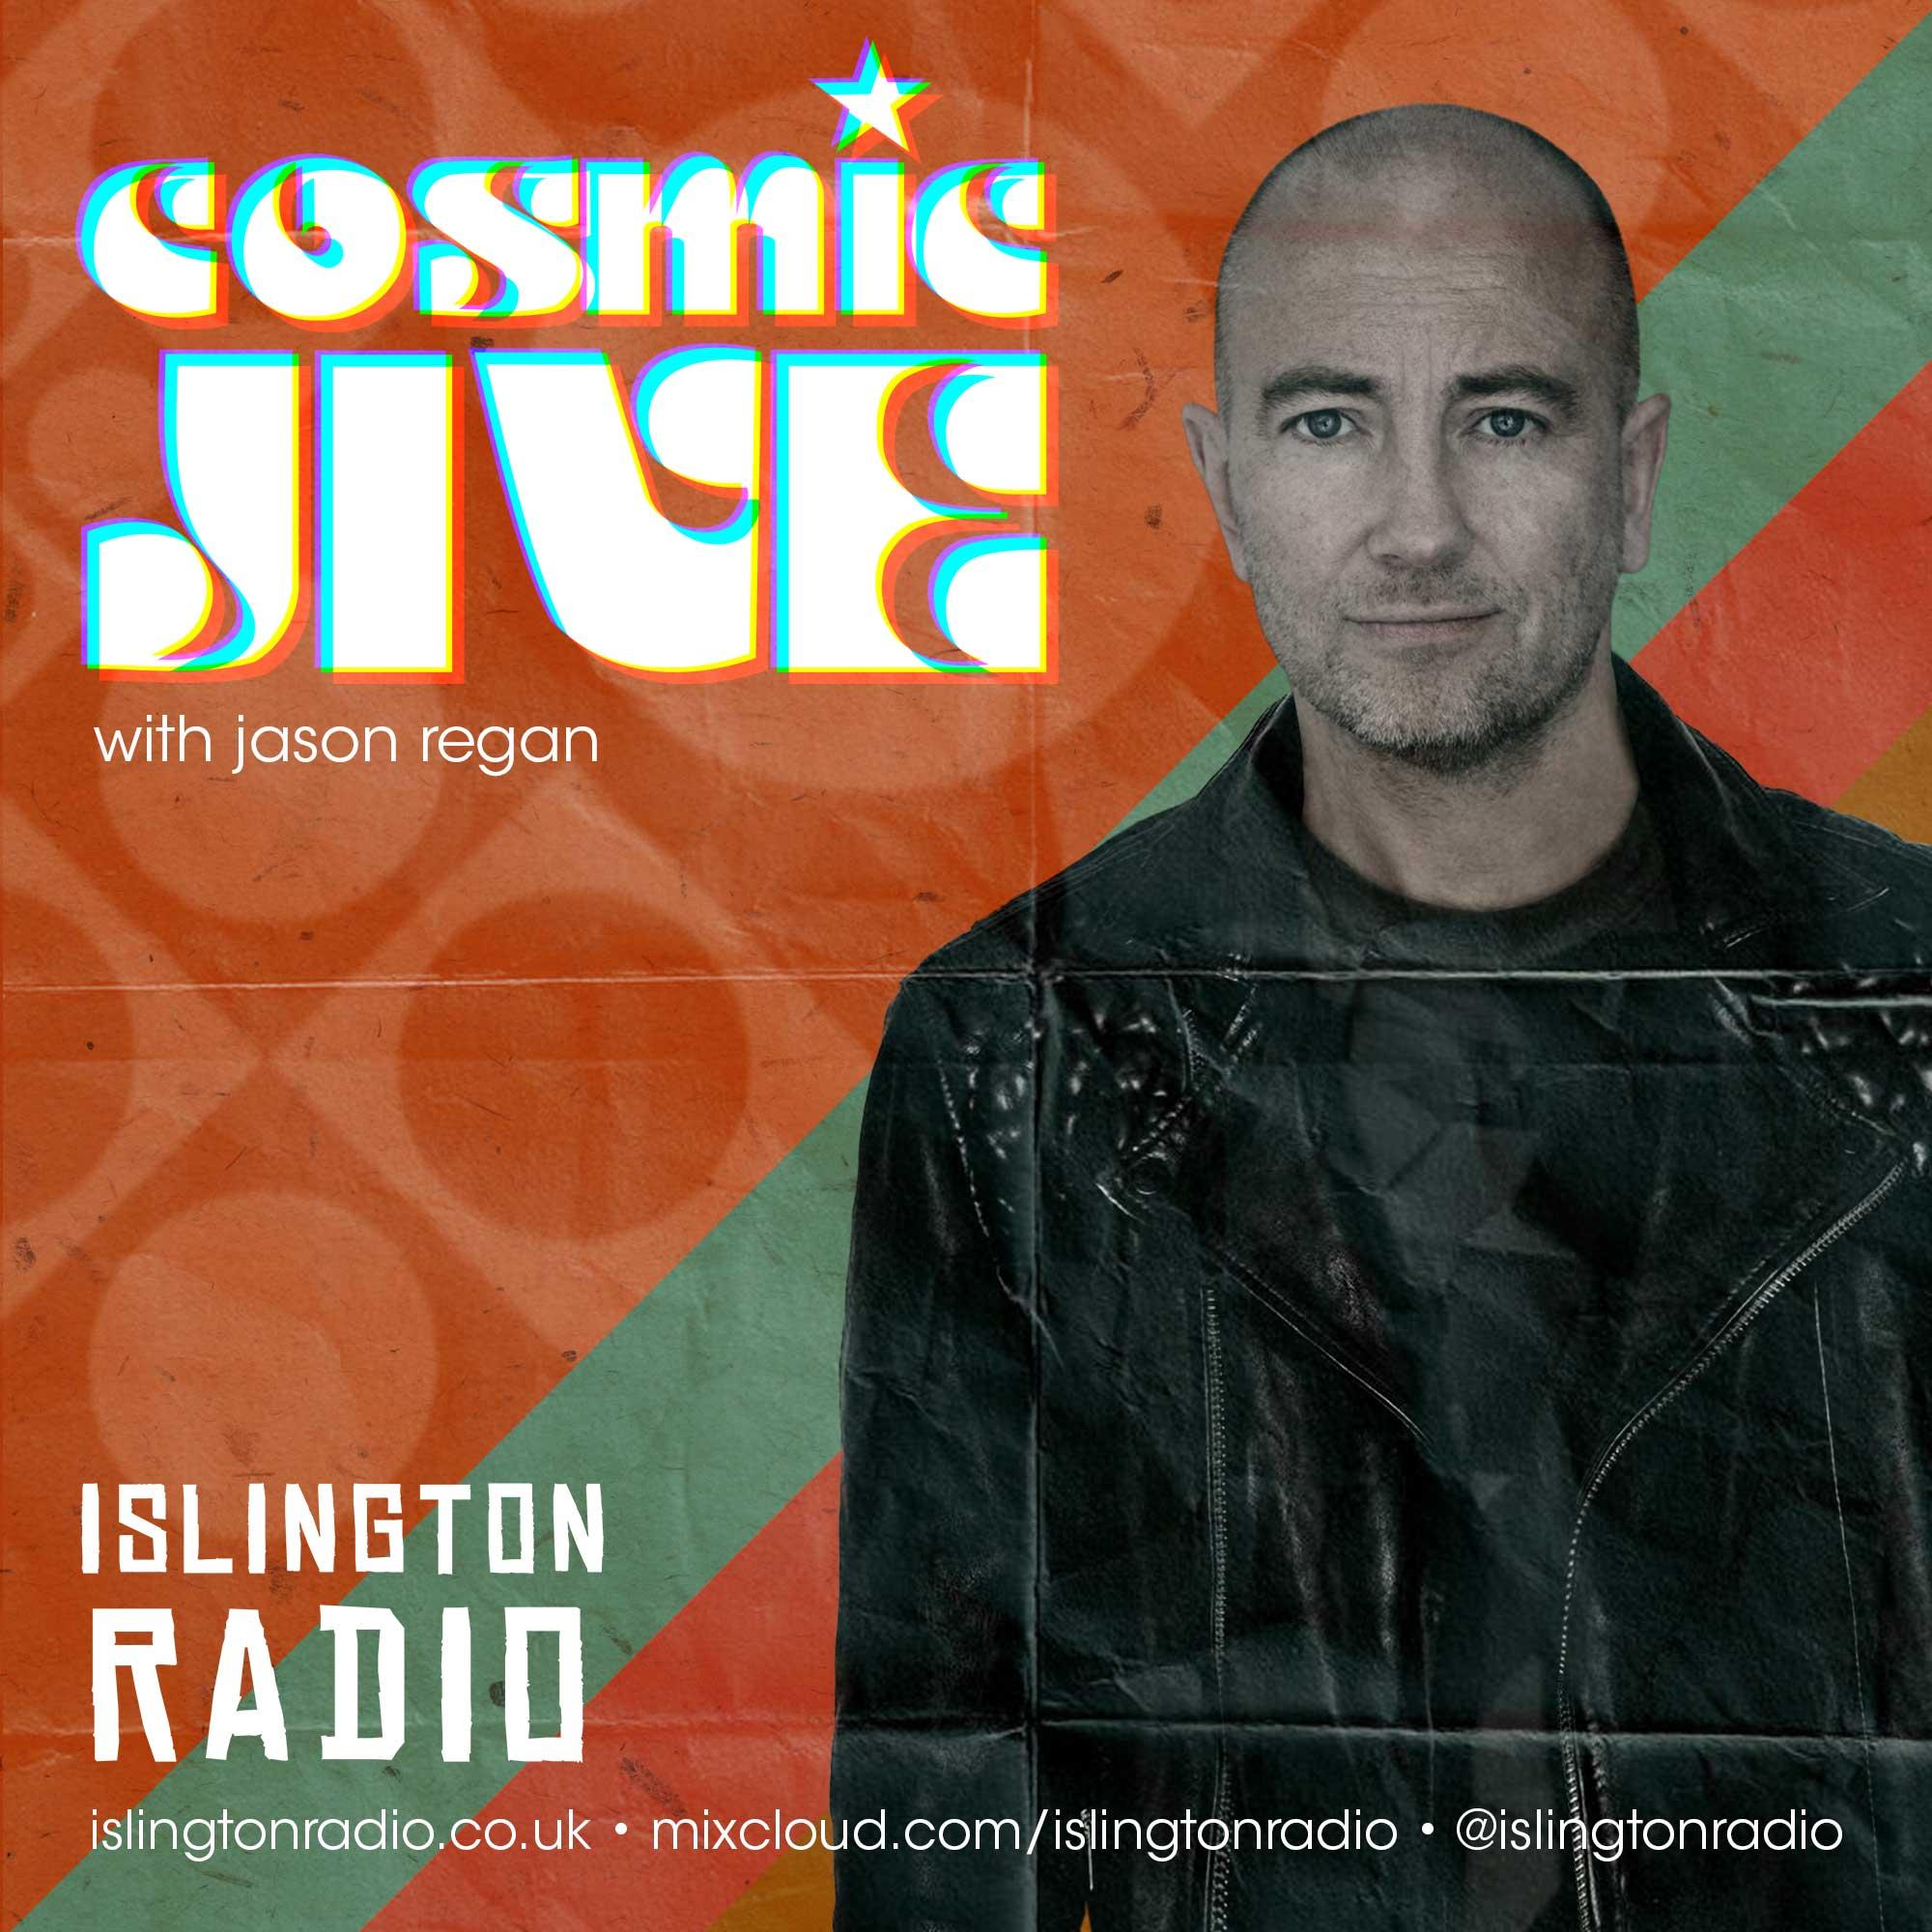 Cosmic Jive Show Jason Regan